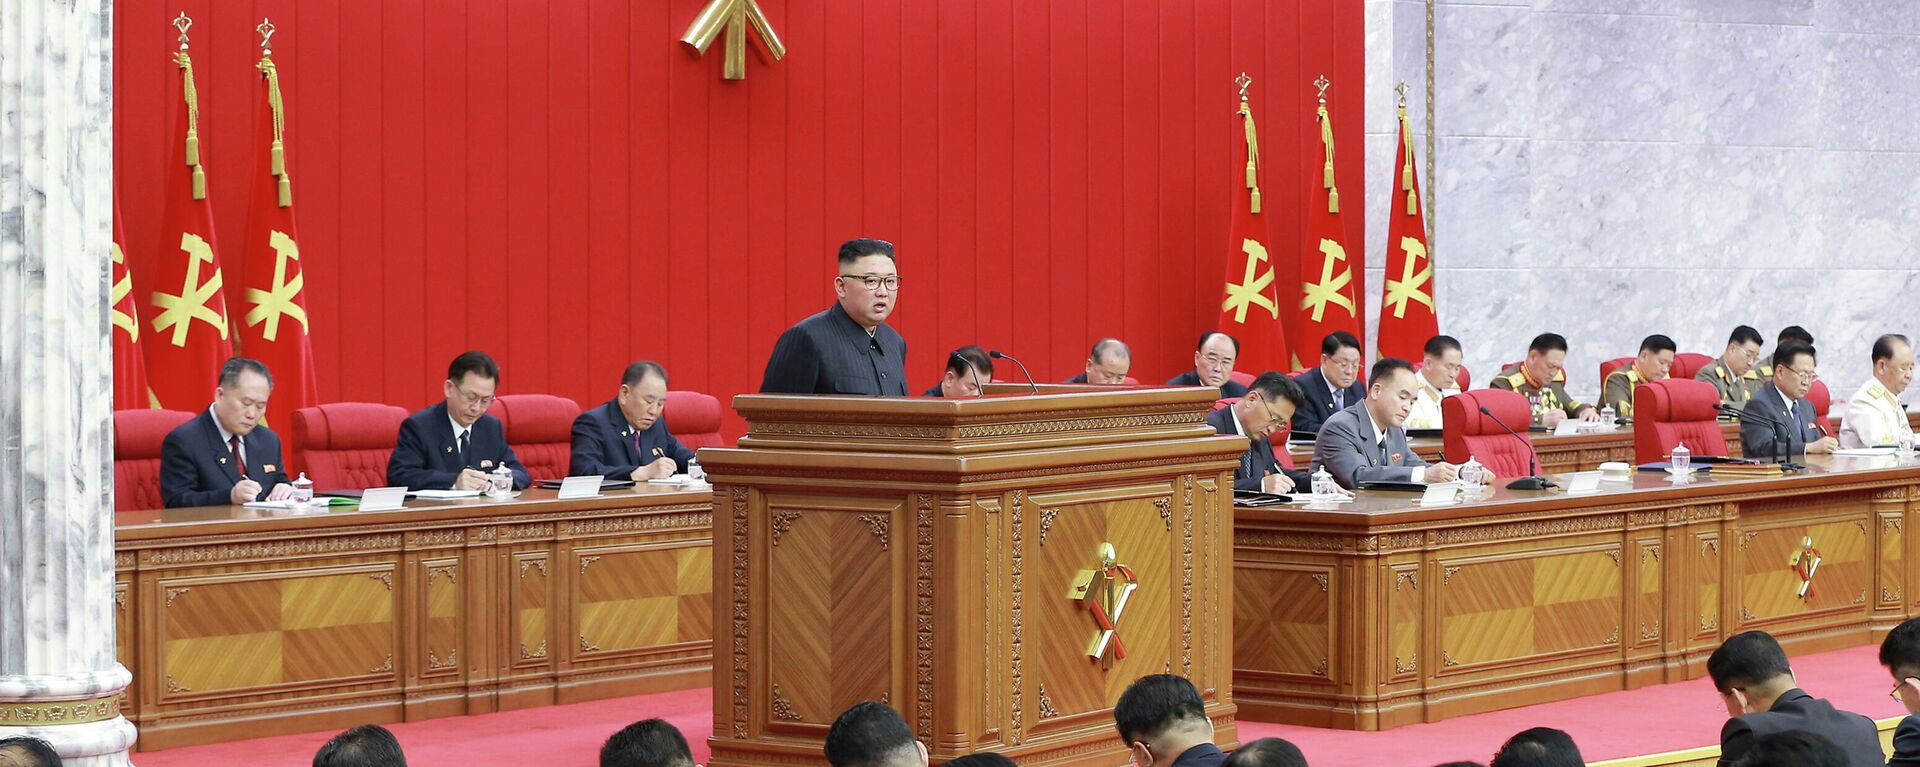 Kim Jong-un, líder supremo de Corea del Norte - Sputnik Mundo, 1920, 18.06.2021